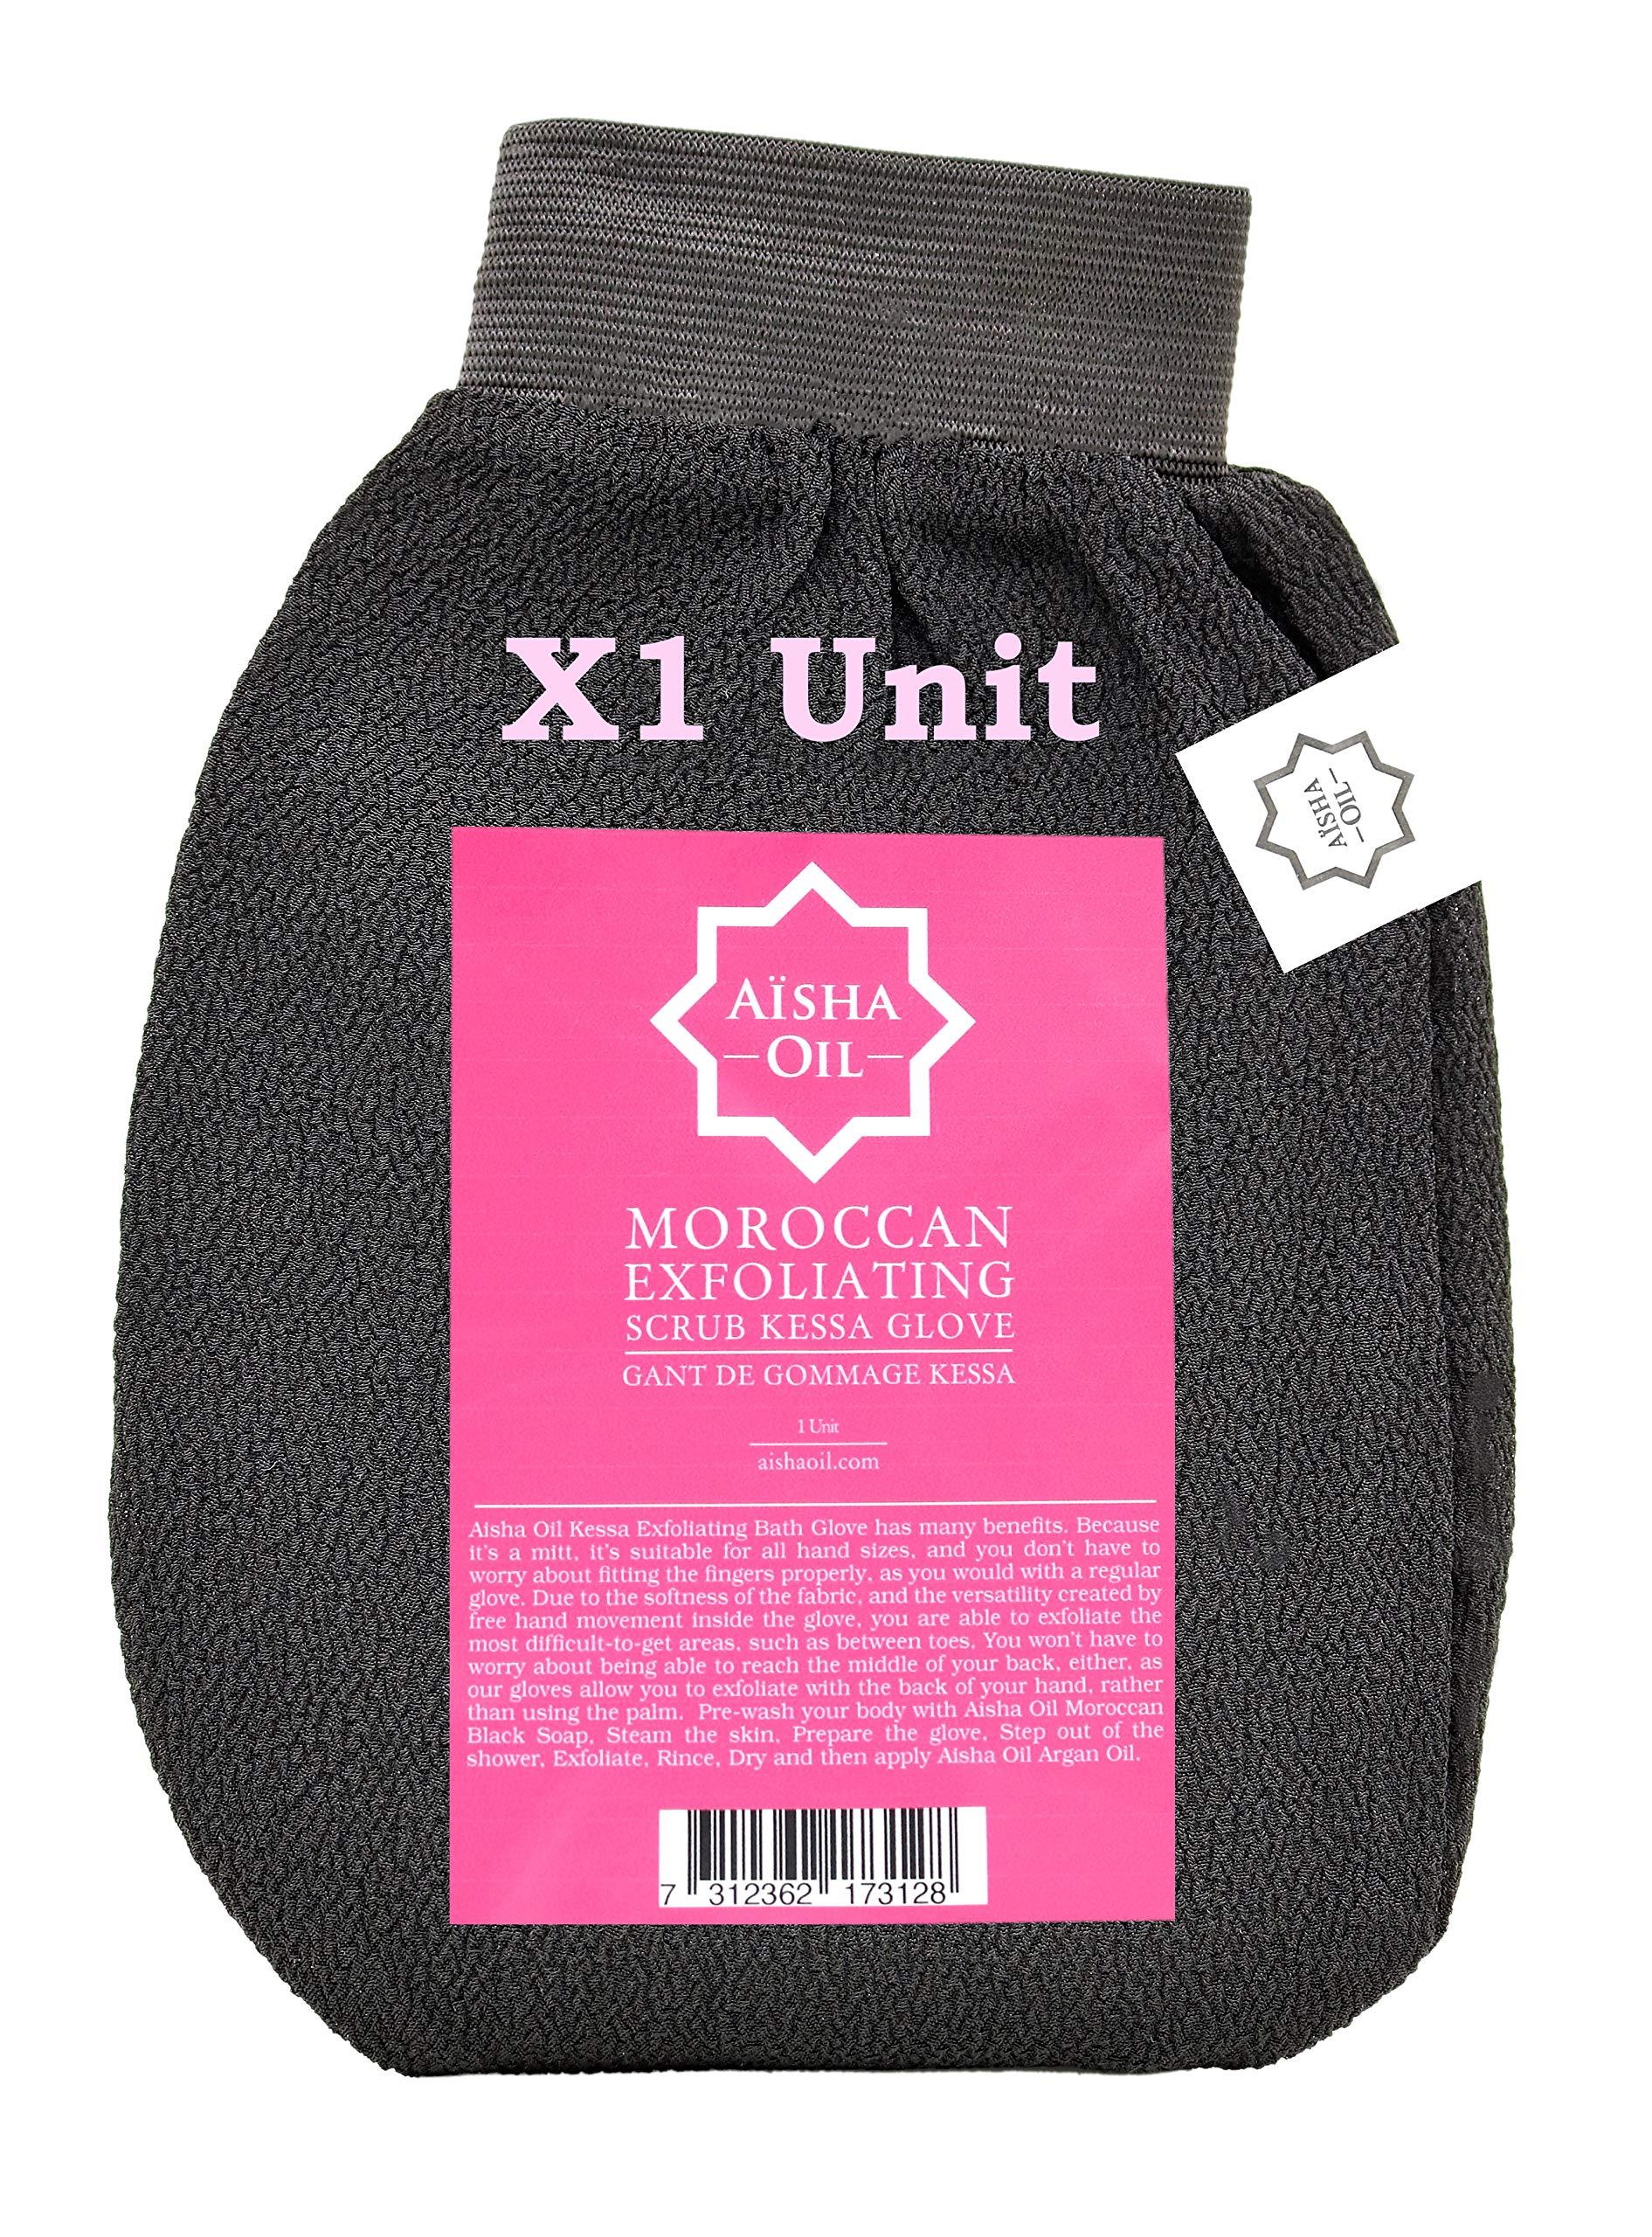 Moroccan Exfoliating Glove By Aisha Oil | Skin-Rejuvenating Body Scrub Glove | Kessa Hammam Exfoliator Mitt For Men & Women | Spa Grade Shower Scrubbing Mitten | Remove Dead Skin Cells | 1-Pack